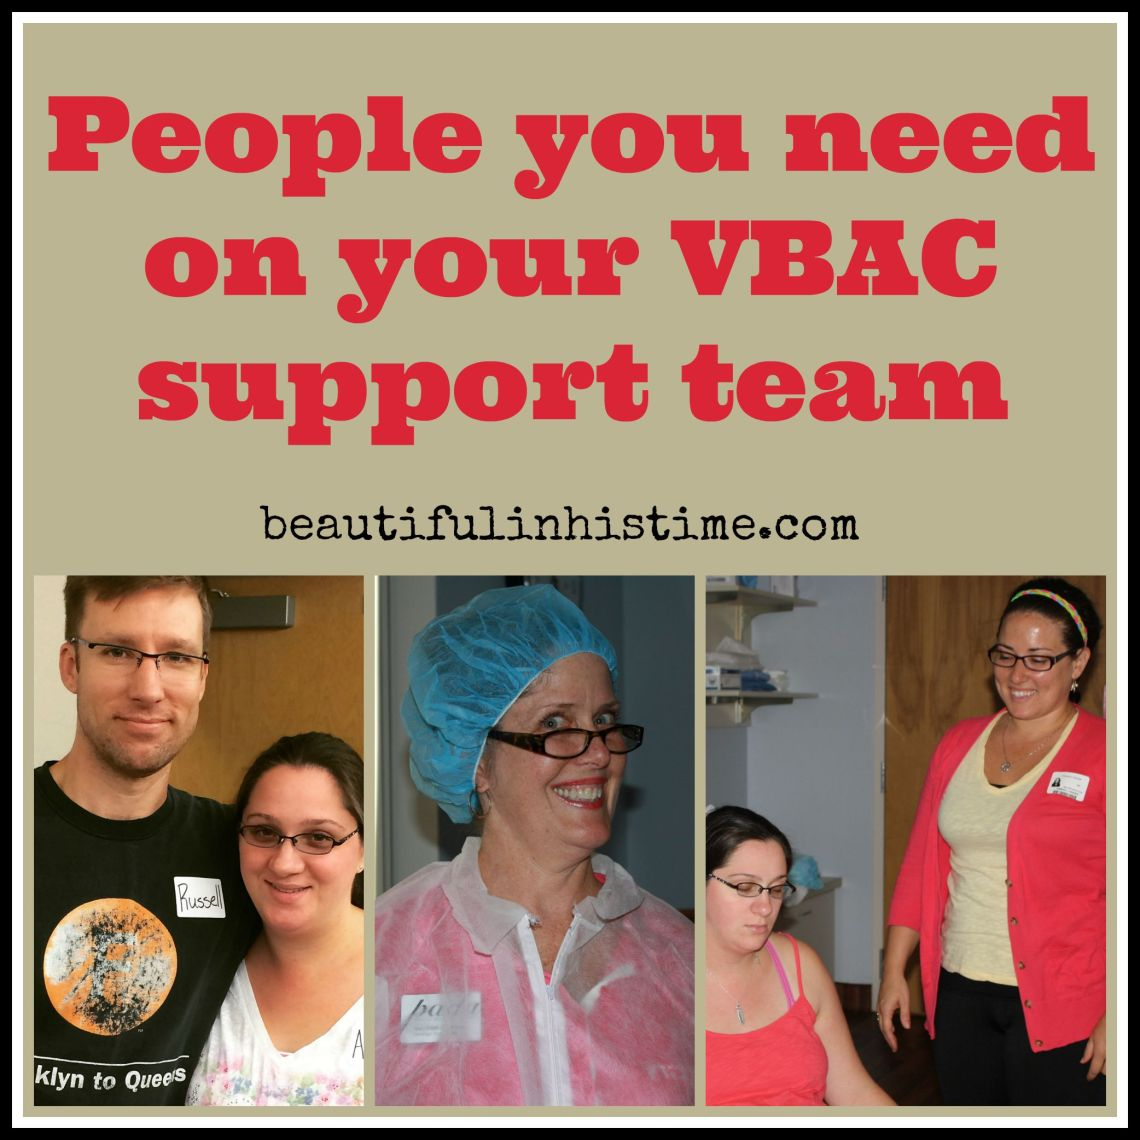 VBAC support